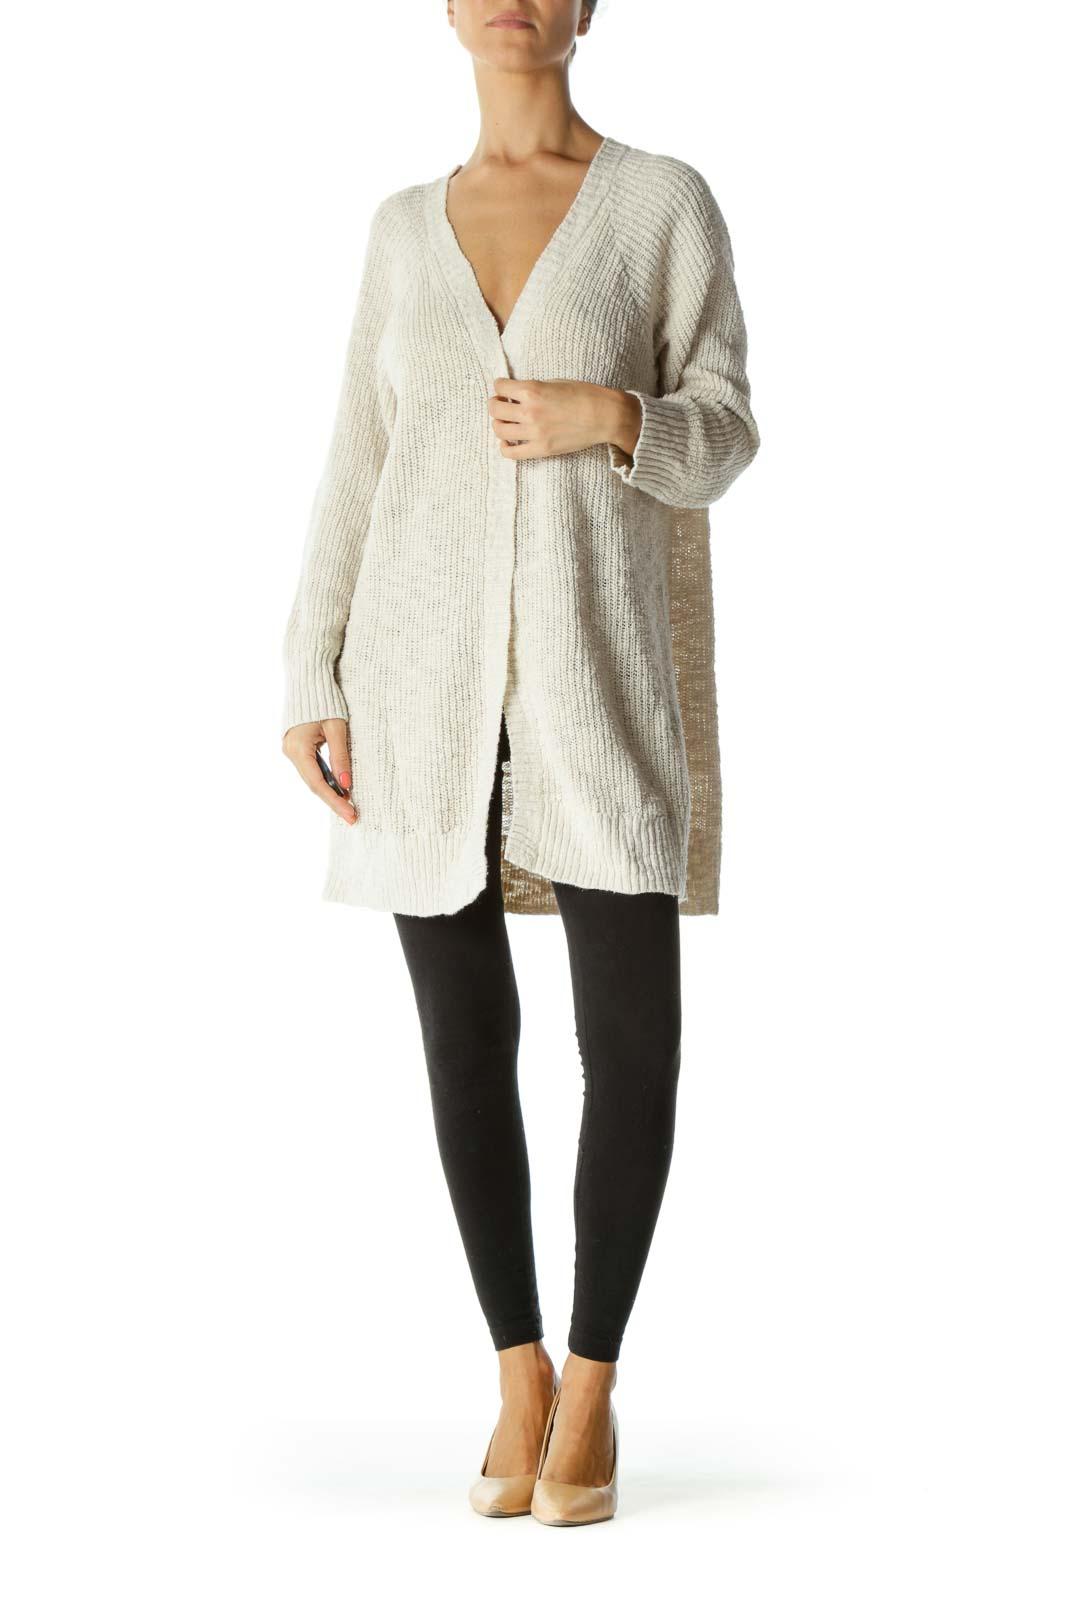 Cream Open Back-Crisscross Detail Open Knit Stretch Plus Size Cardigan